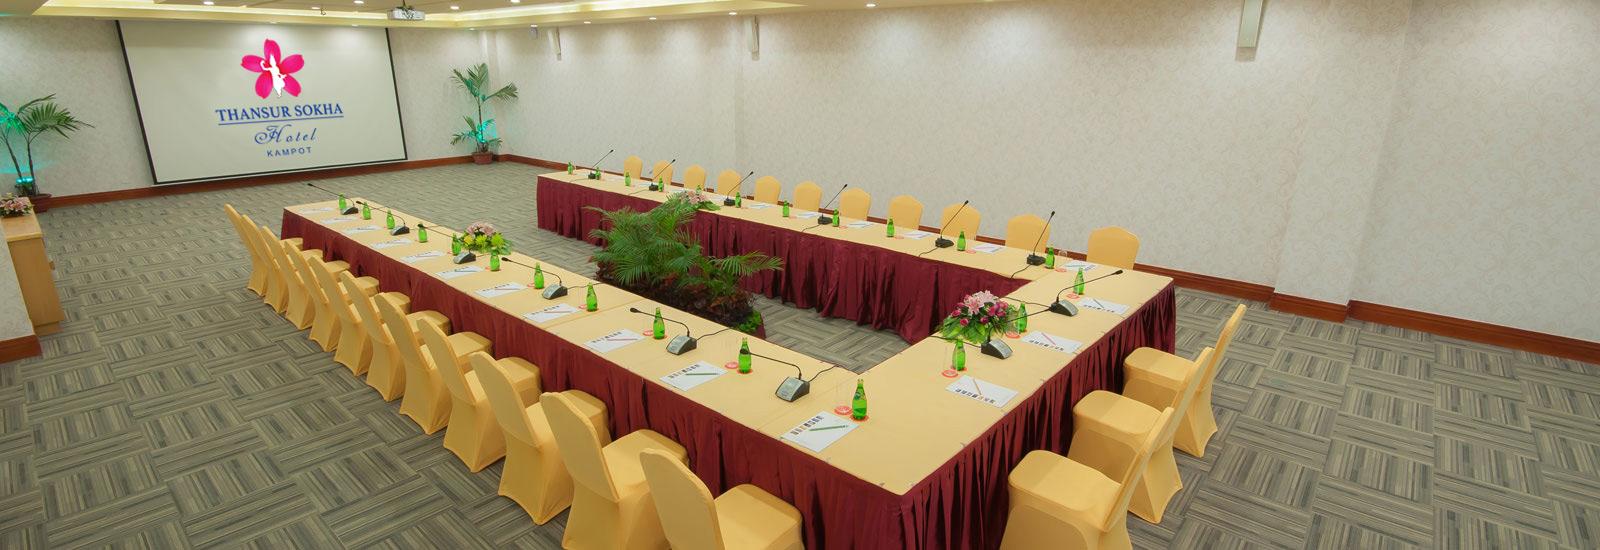 Yihub Meeting Room (U-shape Style)